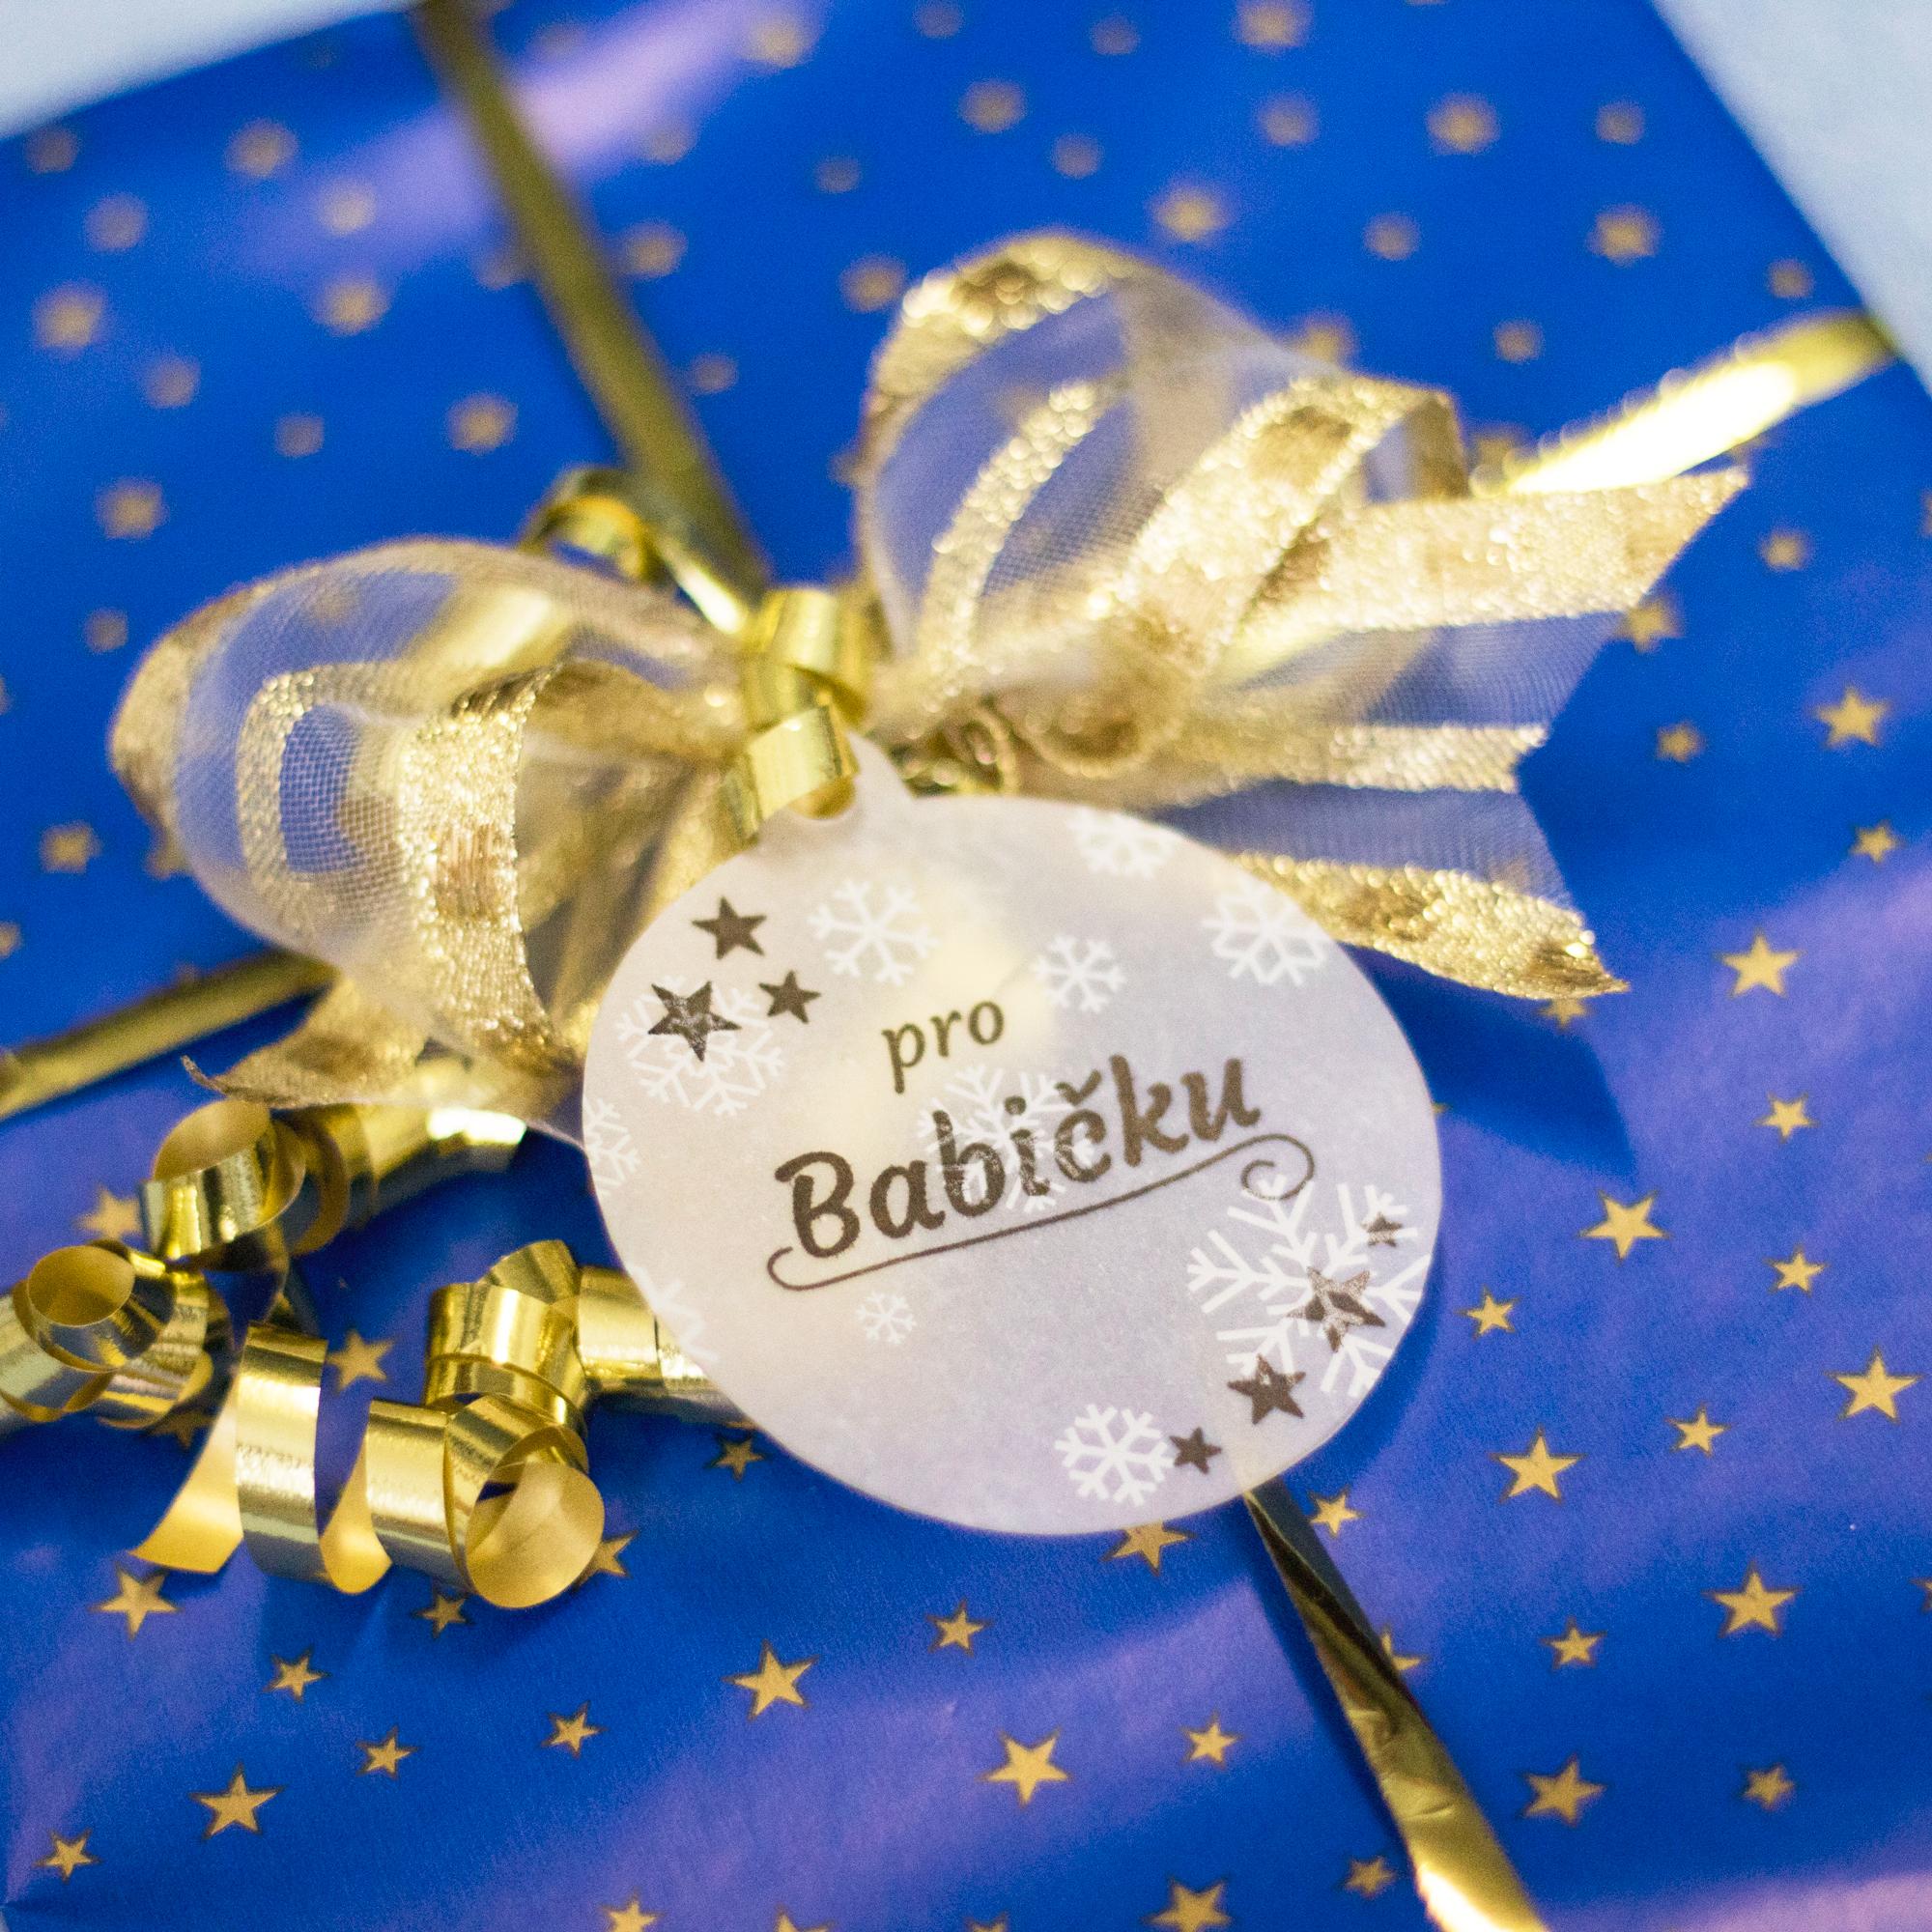 Vánoční jmenovky ve tvaru baňky - Vyrobte si sami